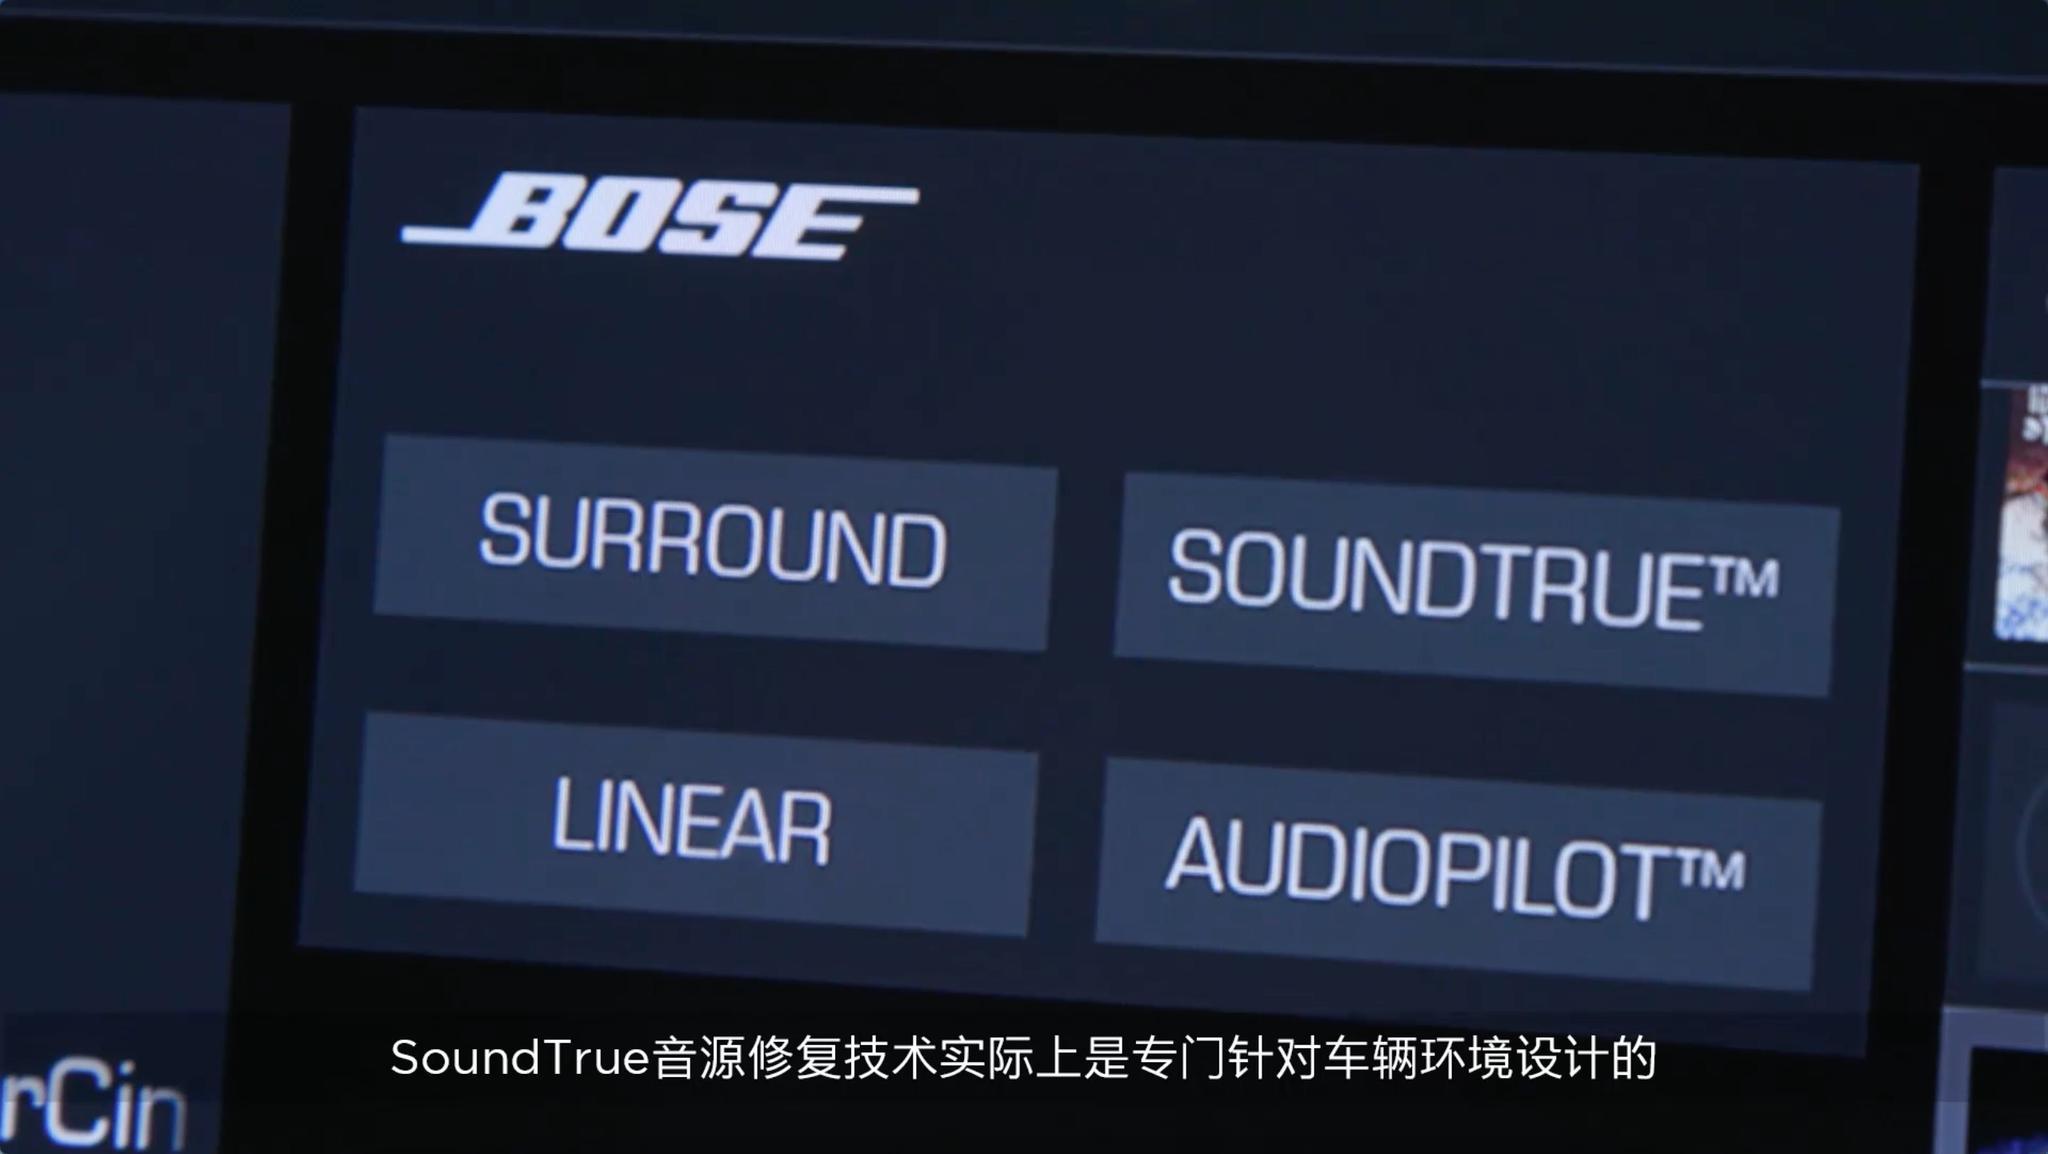 SoundTrue技术目前已搭载于量产车型